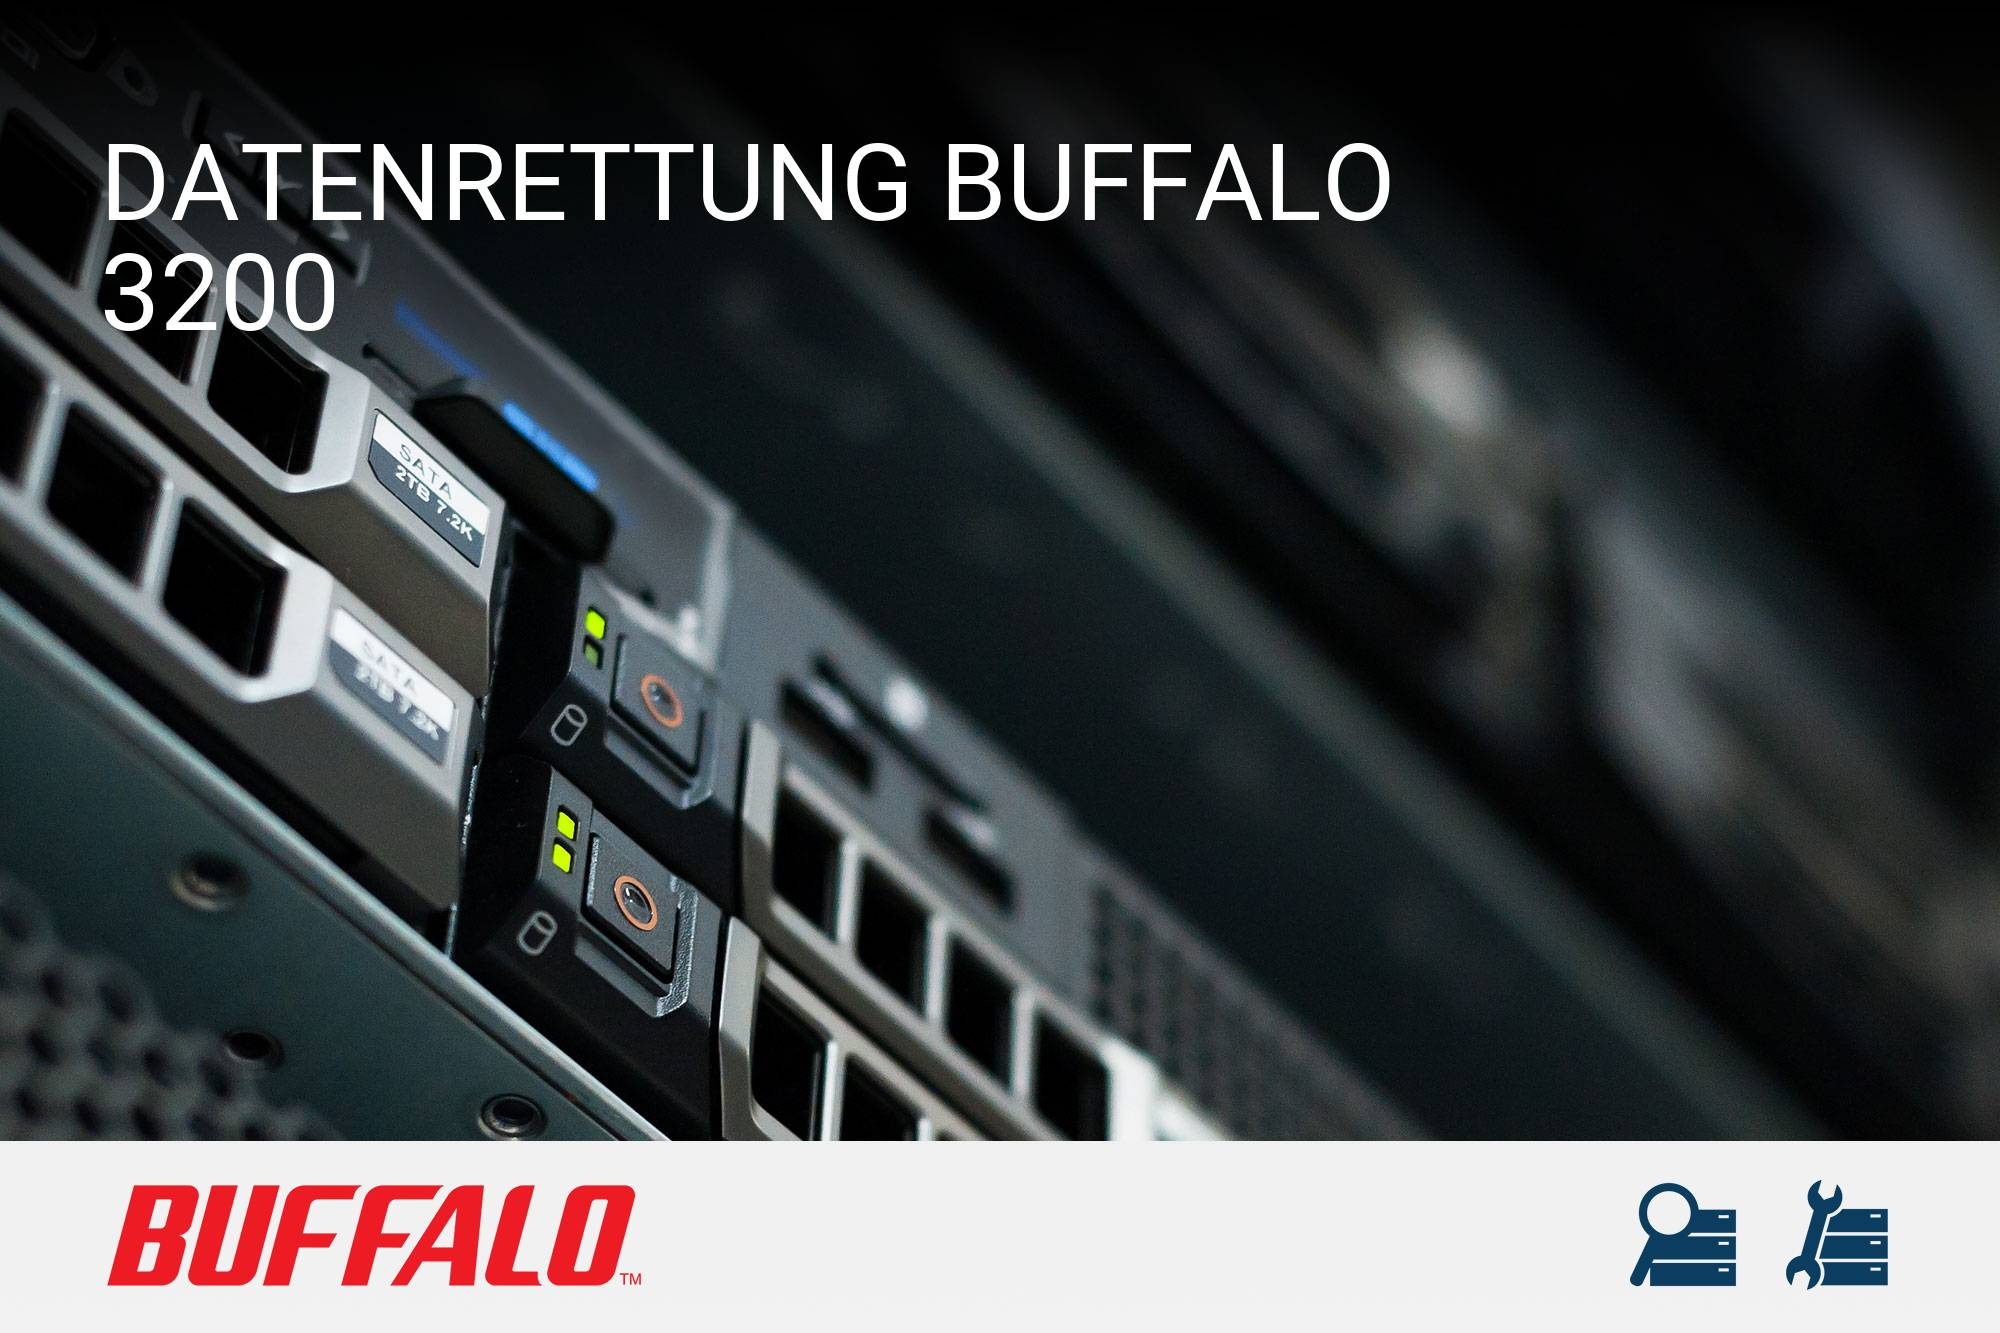 Buffalo 3200